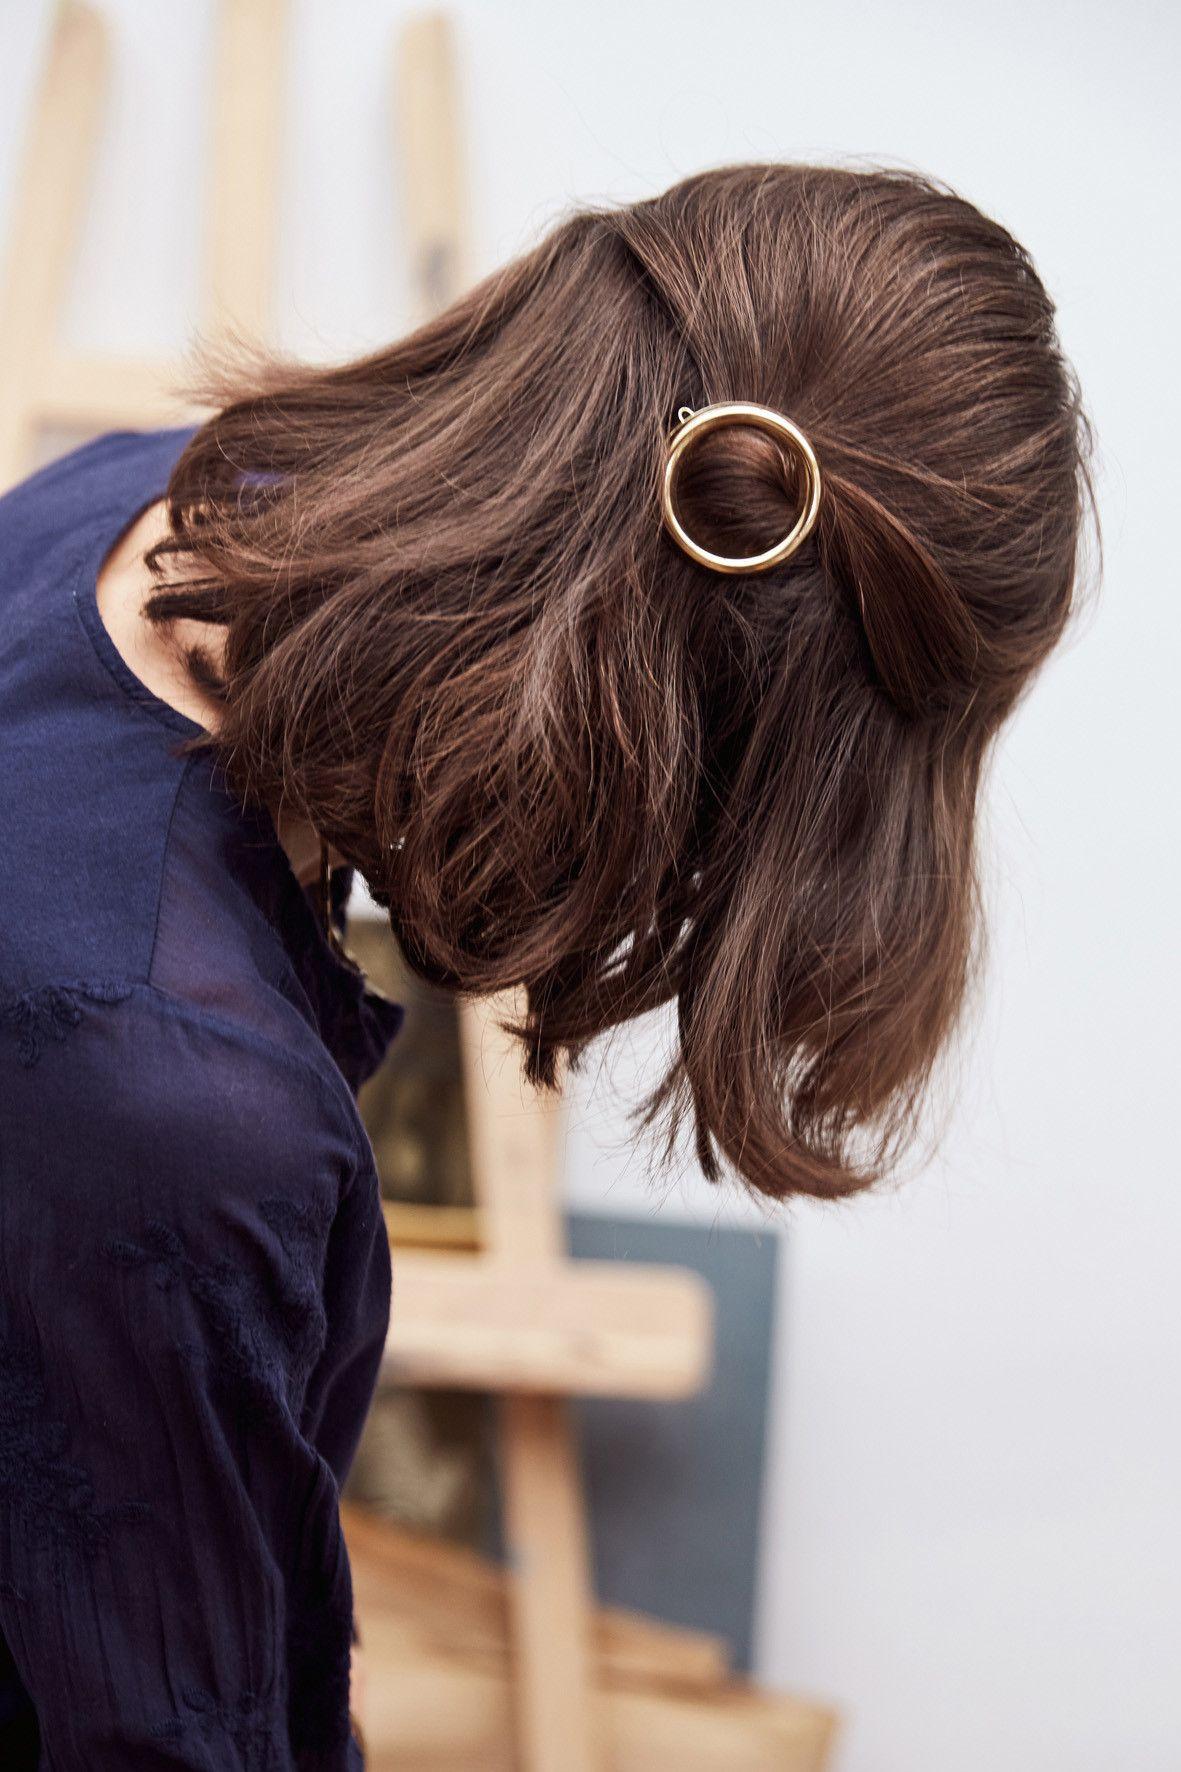 Barrette Justine Balzac Paris Hair styles Pinterest